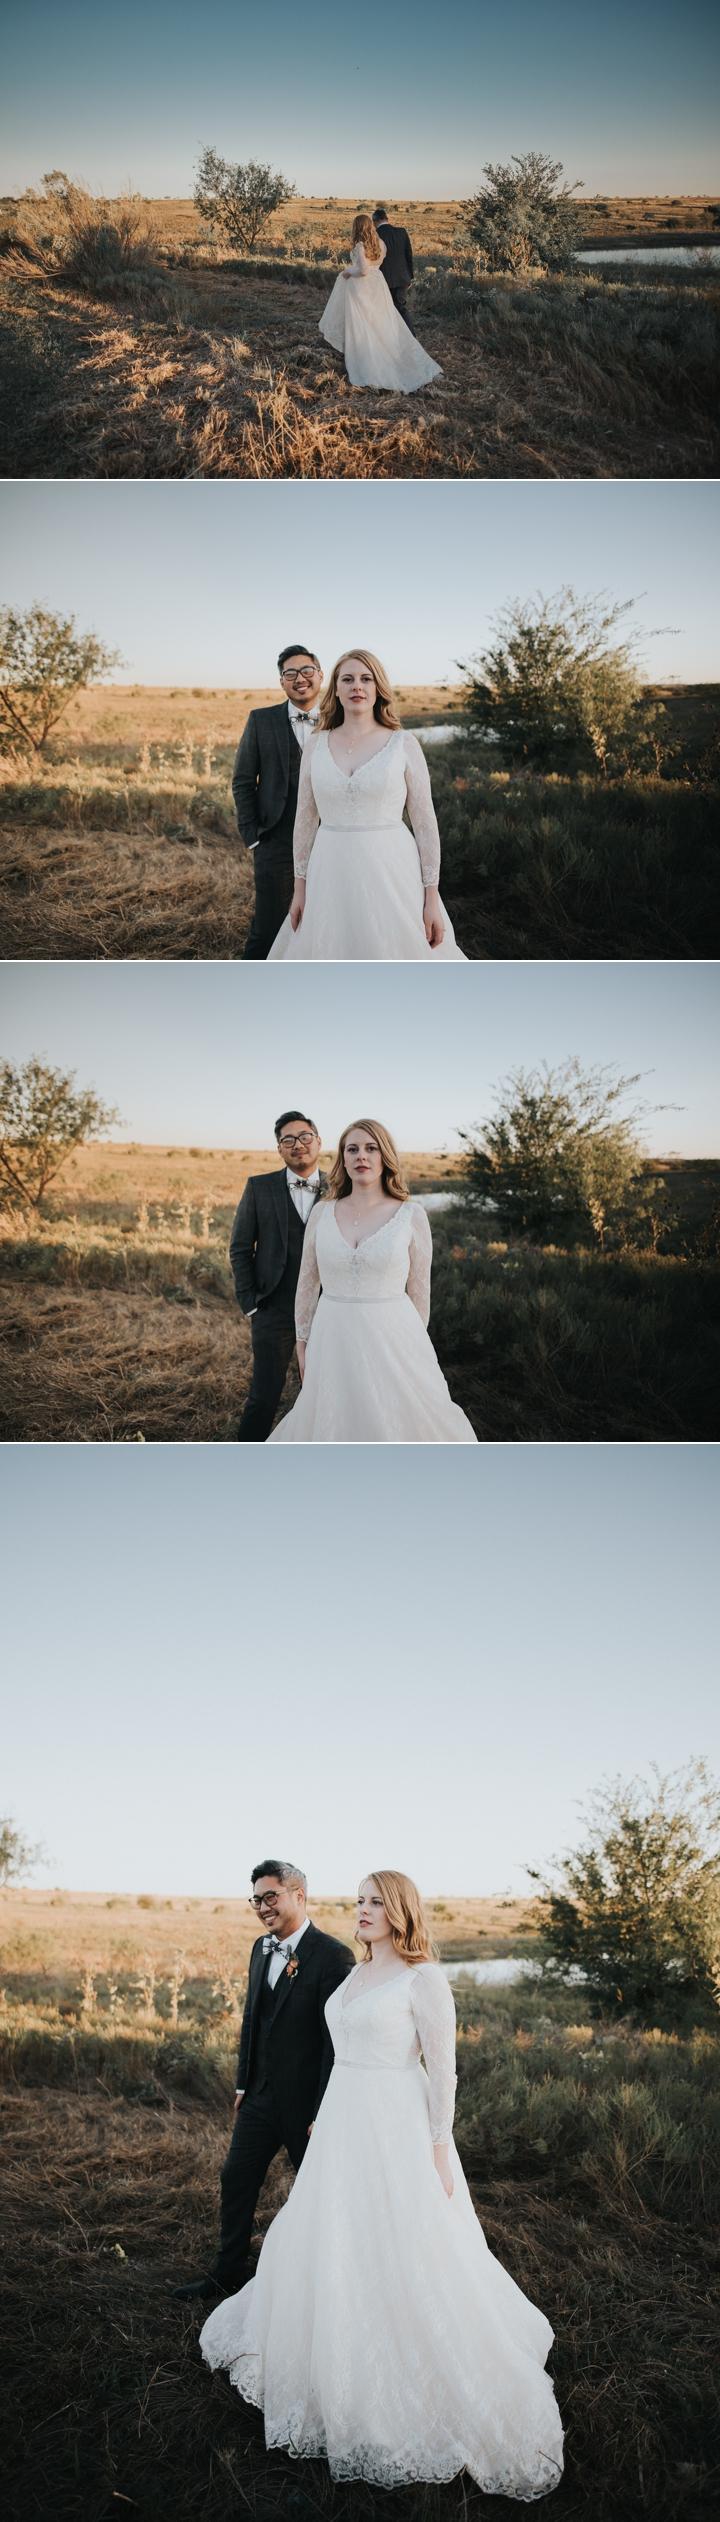 dallas-wedding-photographers-vb 22.jpg